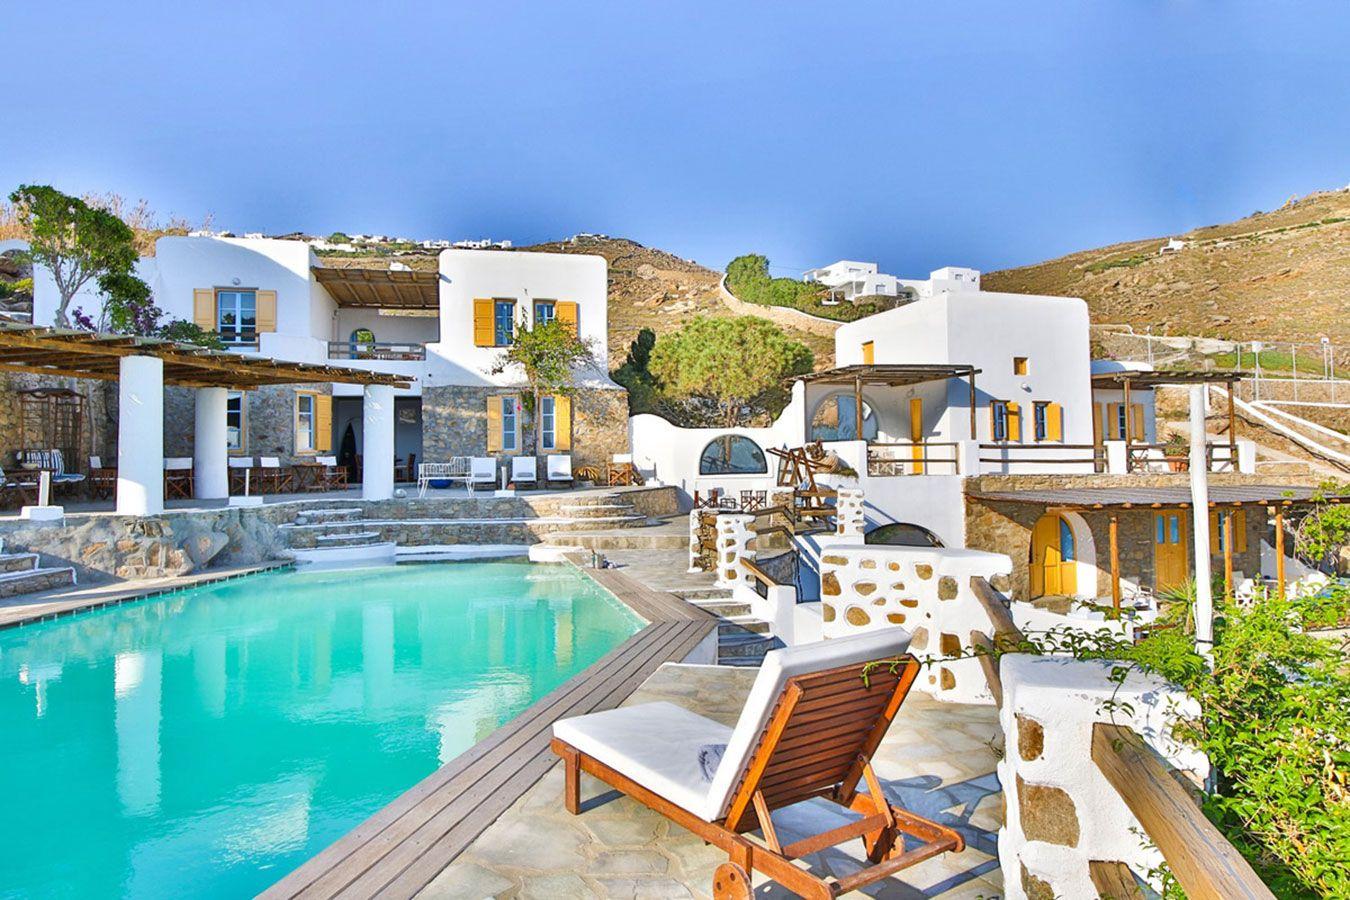 Anerousses Mykonian Traditional Houses - Μύκονος ✦ 3 Ημέρες (2 Διανυκτερεύσεις) ✦ 2 άτομα ✦ Χωρίς Πρωινό ✦ 01/06/2021 έως 30/06/2021 ✦ Κοντά στην παραλία!